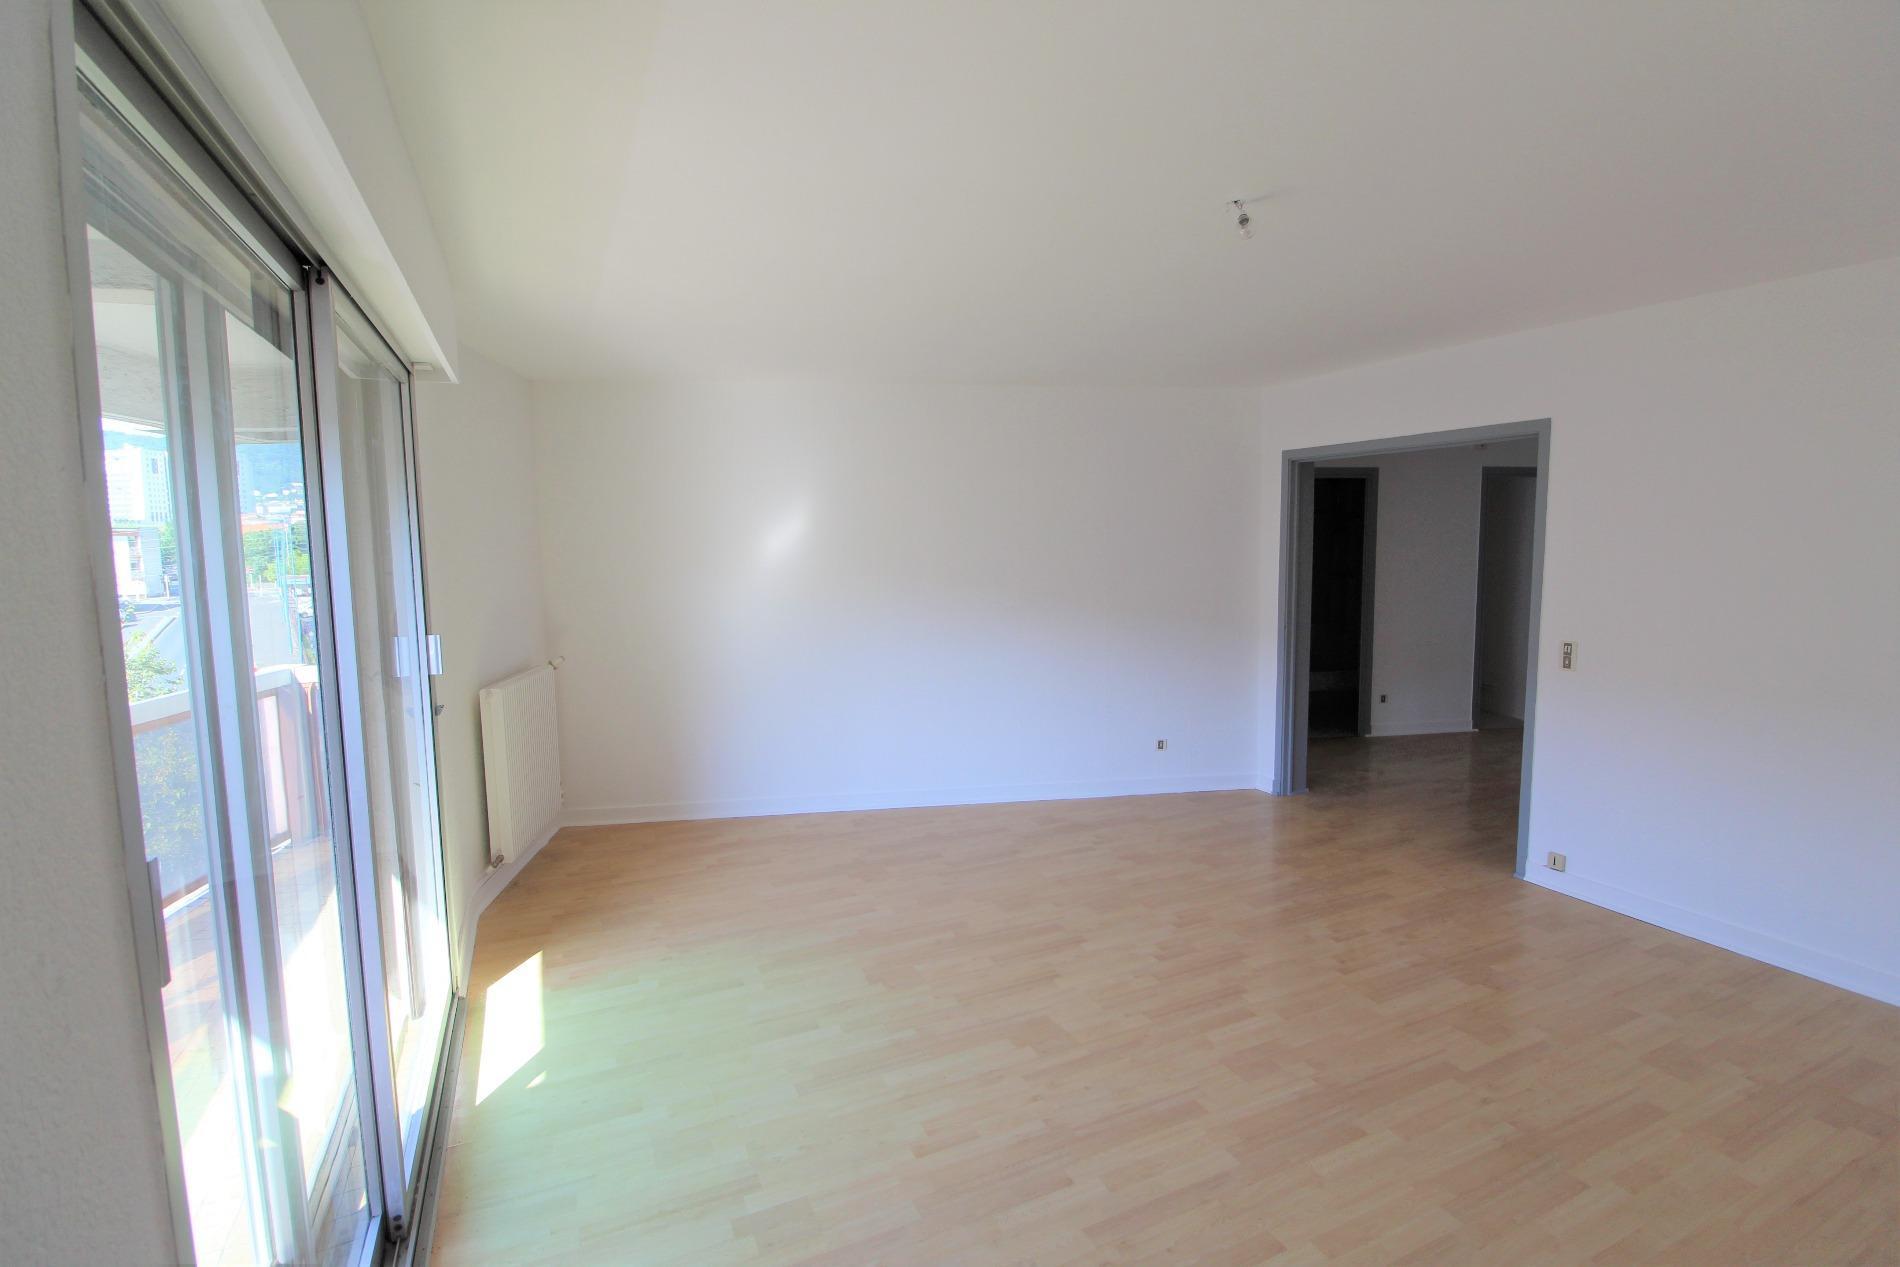 vente immo s lect 63. Black Bedroom Furniture Sets. Home Design Ideas